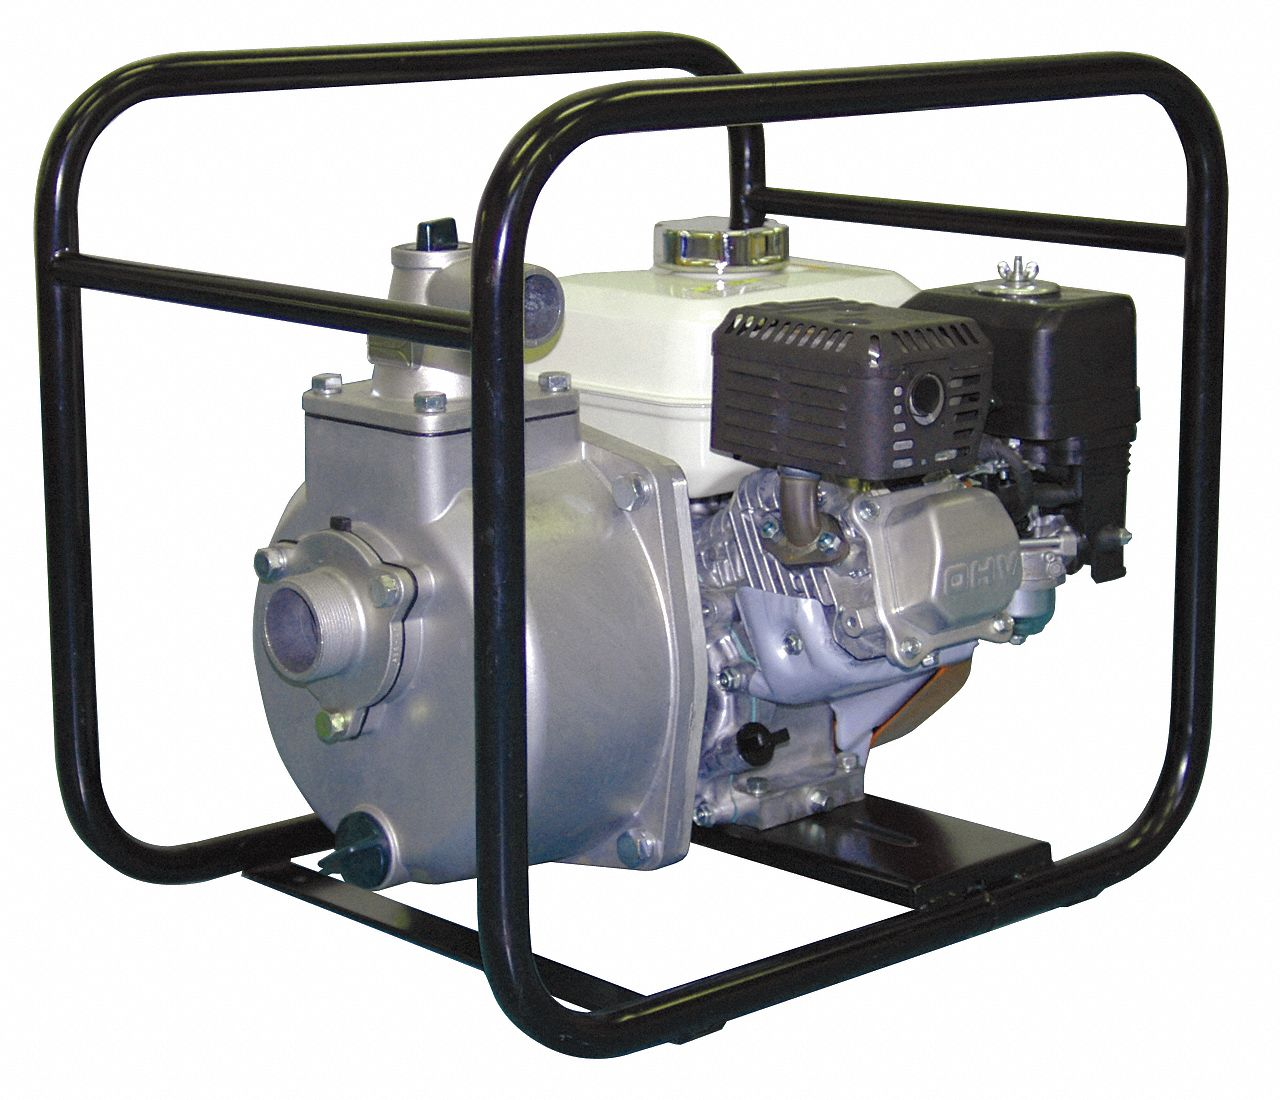 Dayton High Pressure Pumps : Engine driven pumps tools for shop